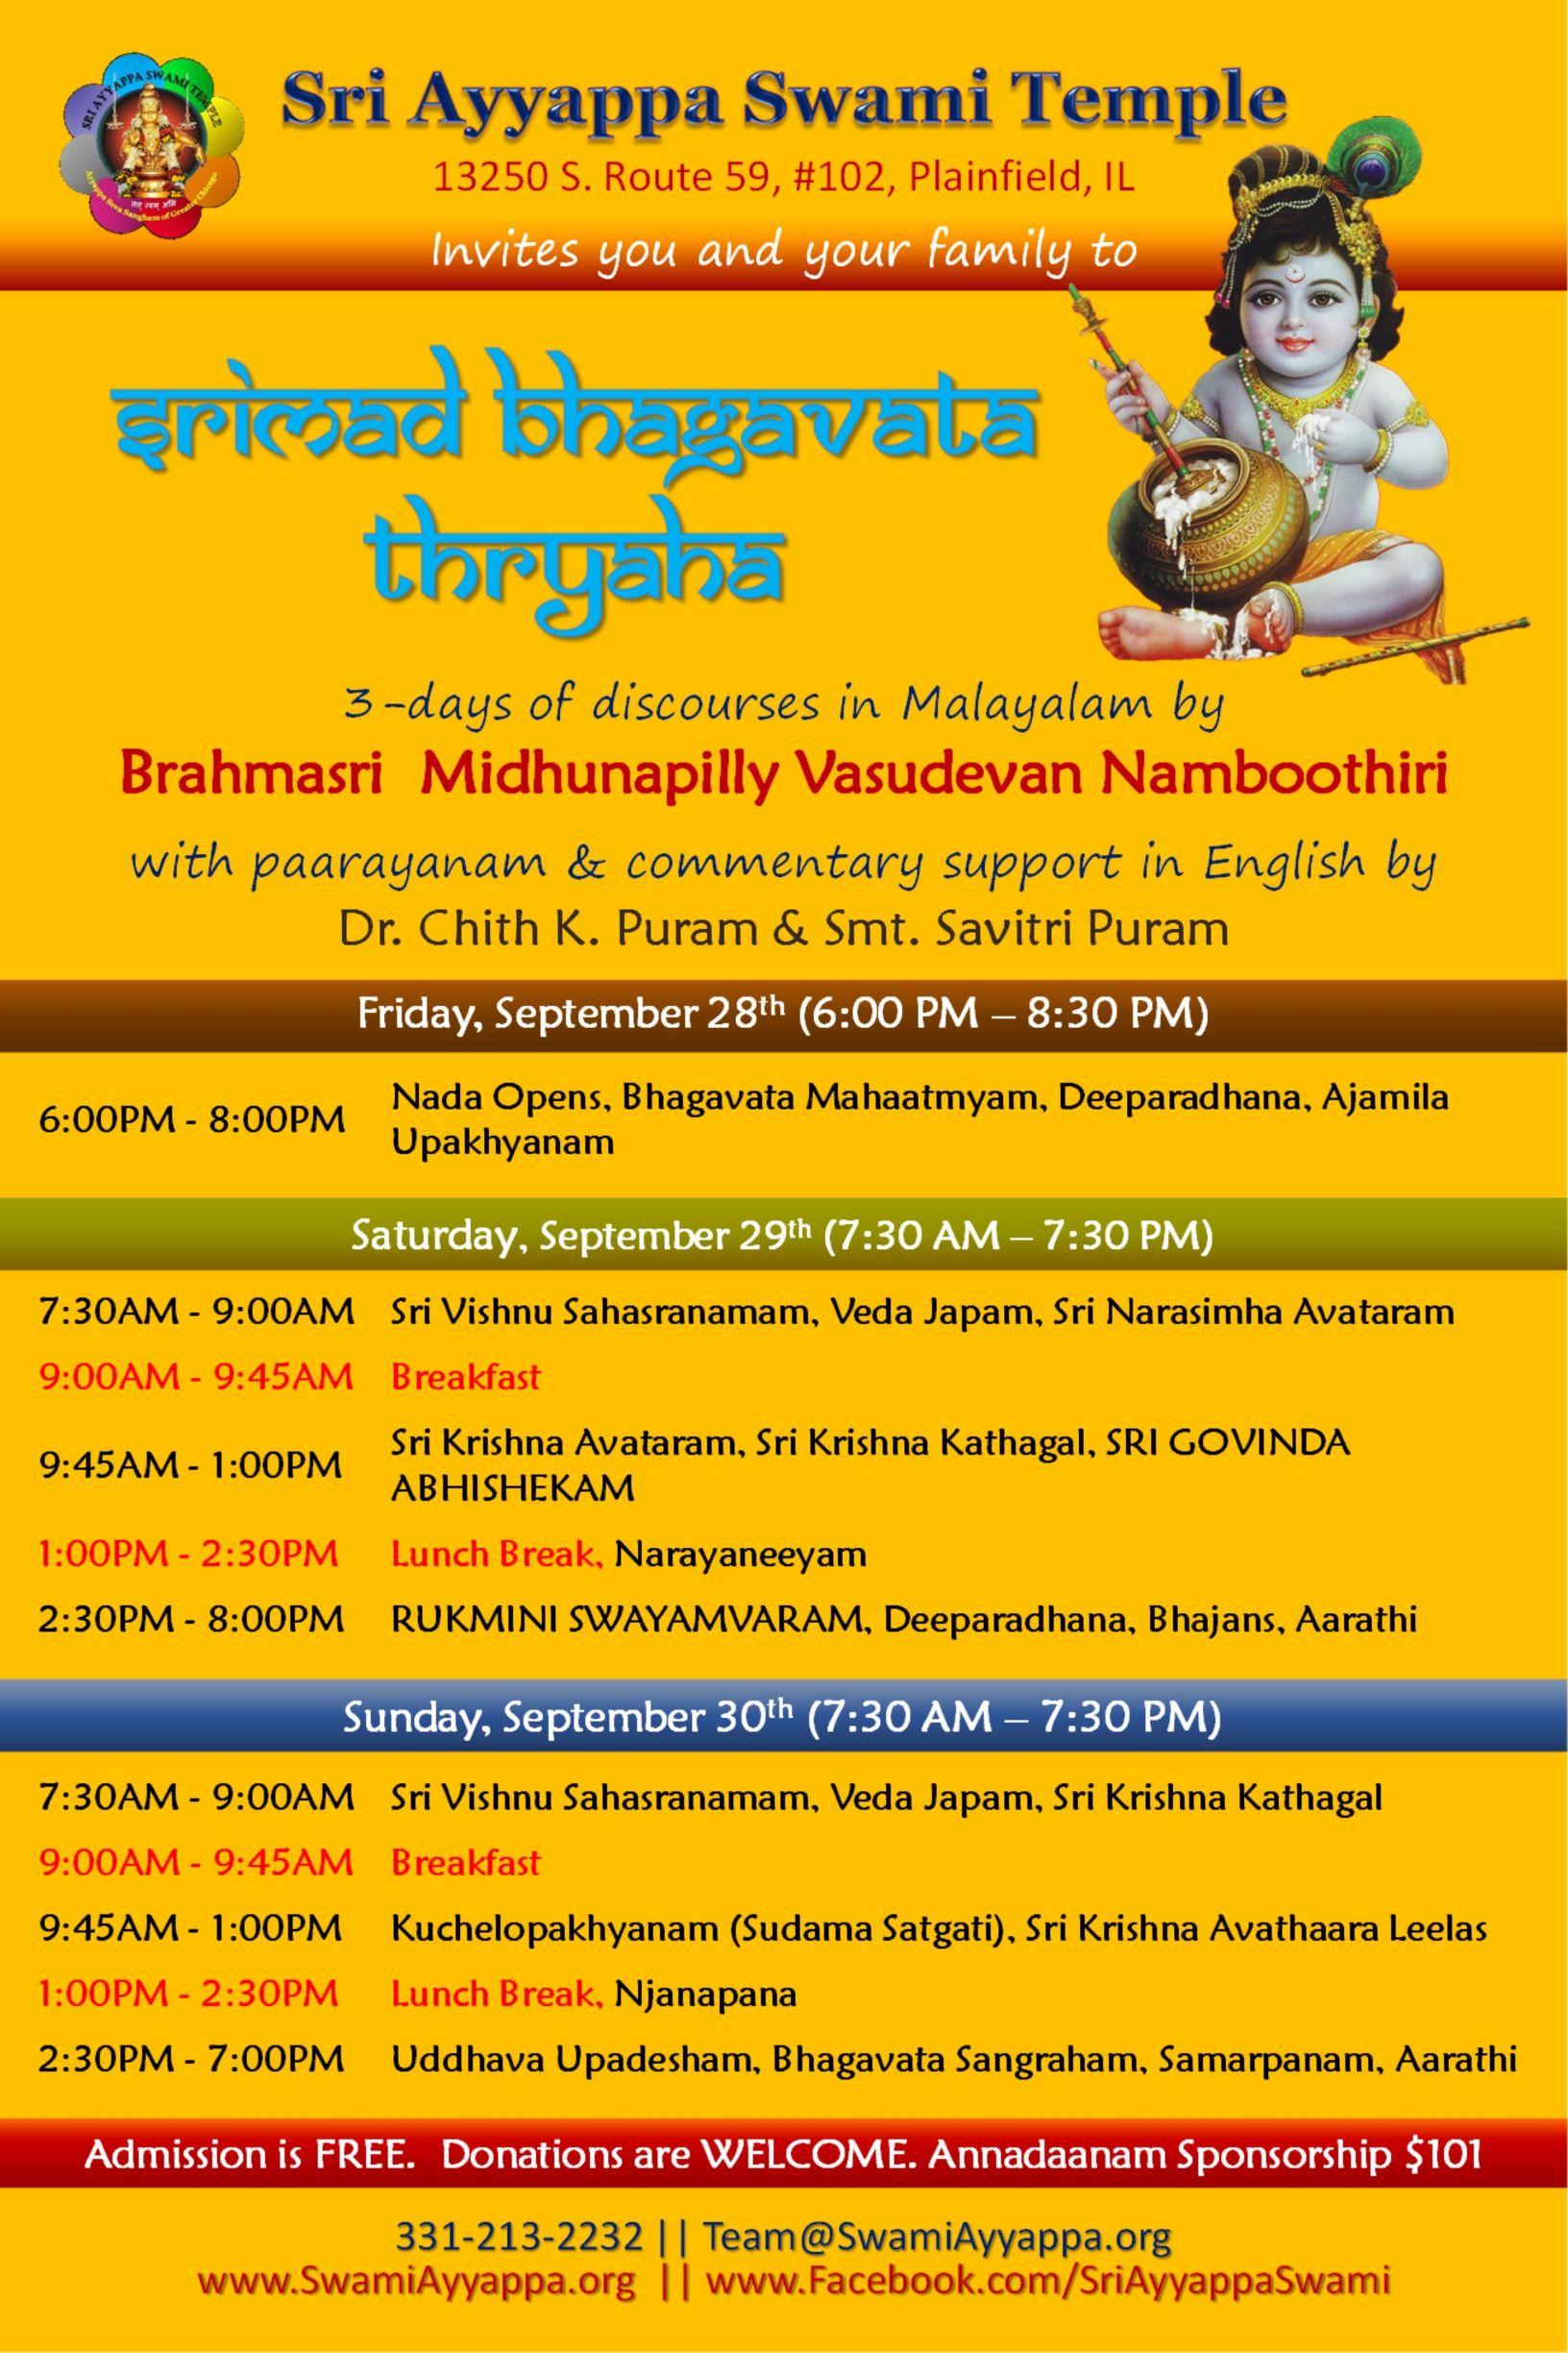 Srimad Bhagavata Thrayaha by Brahmasri Midhunapilly